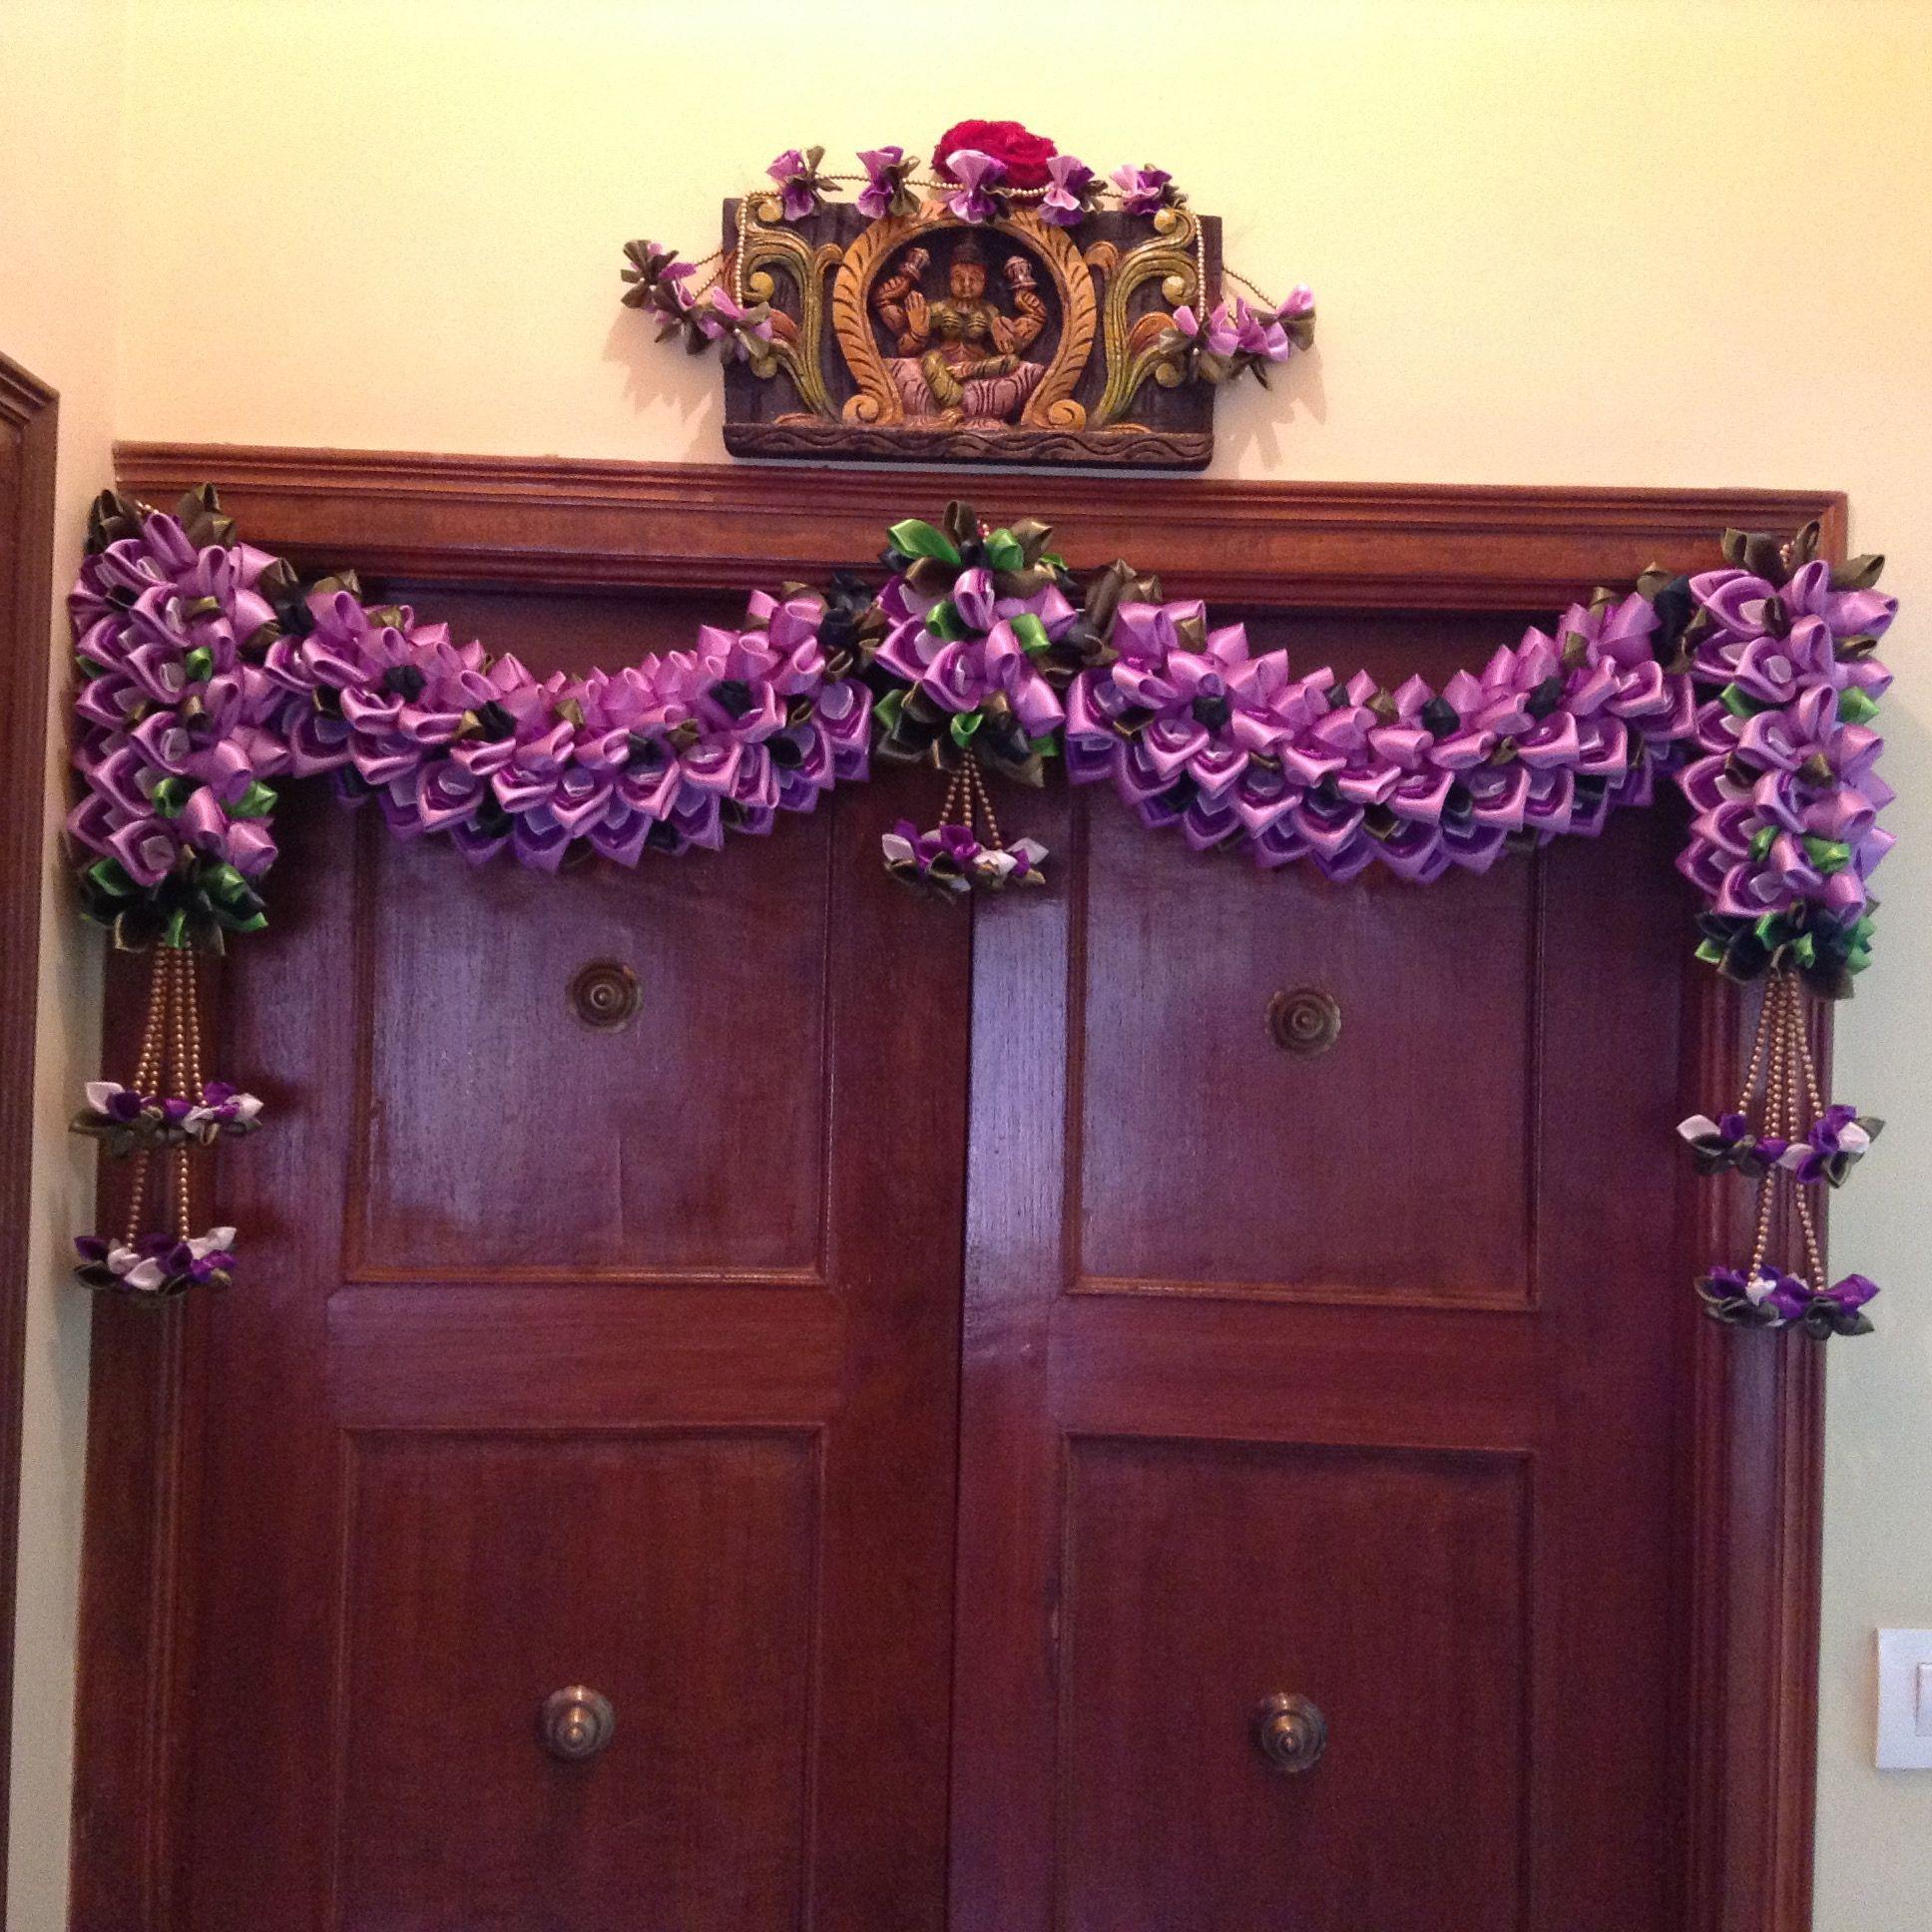 Door Hanging Designs door hanging decorative five hand painted elephant stringed together with beads and brass bell Shivratri 2017 Door Hanging